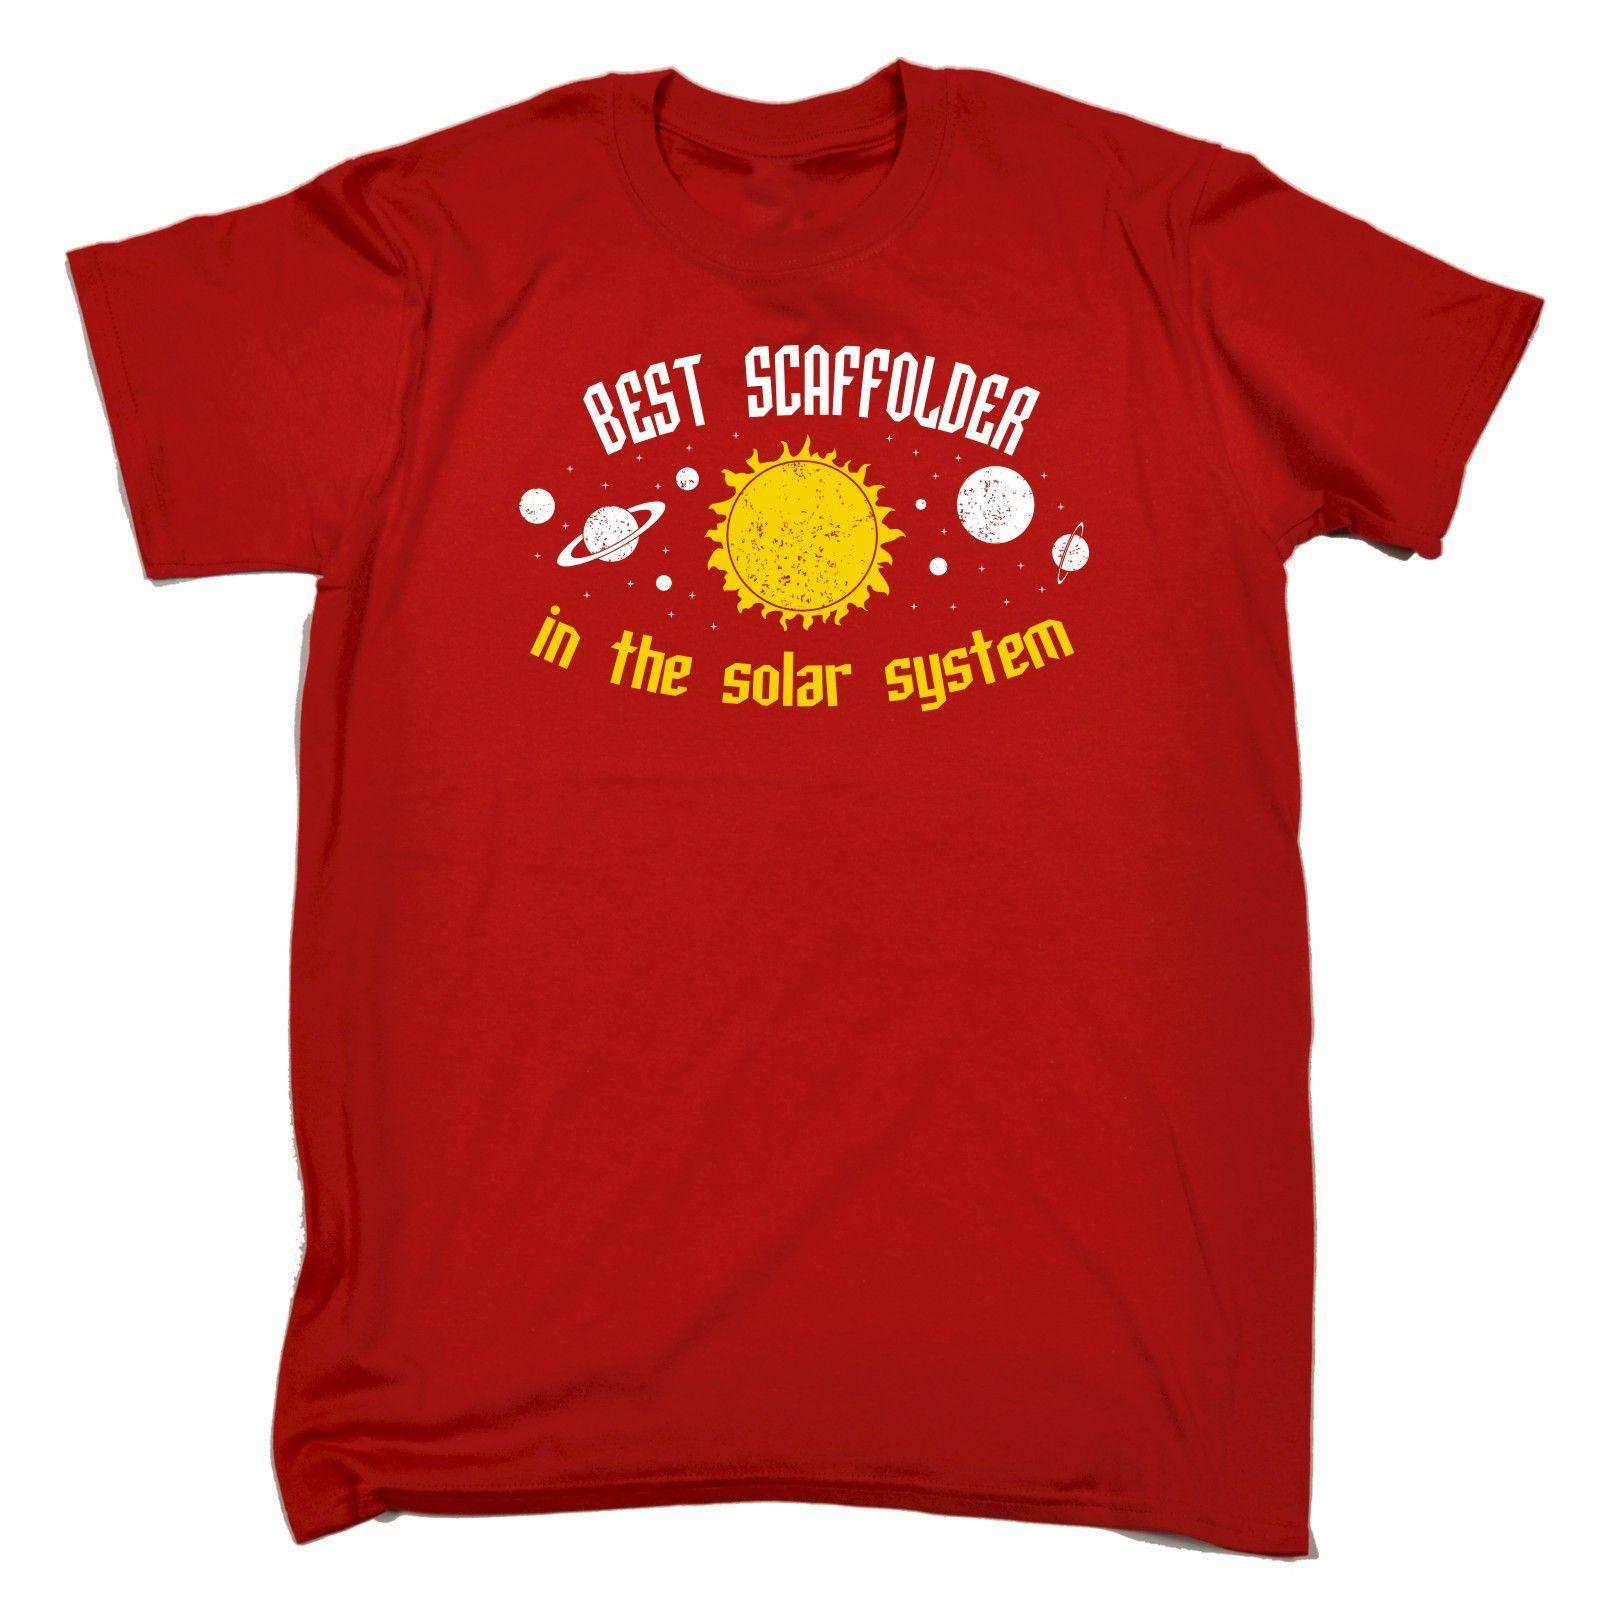 123t USA Men's Best Scaffolder In The Solar System Galaxy Design Funny T-Shirt